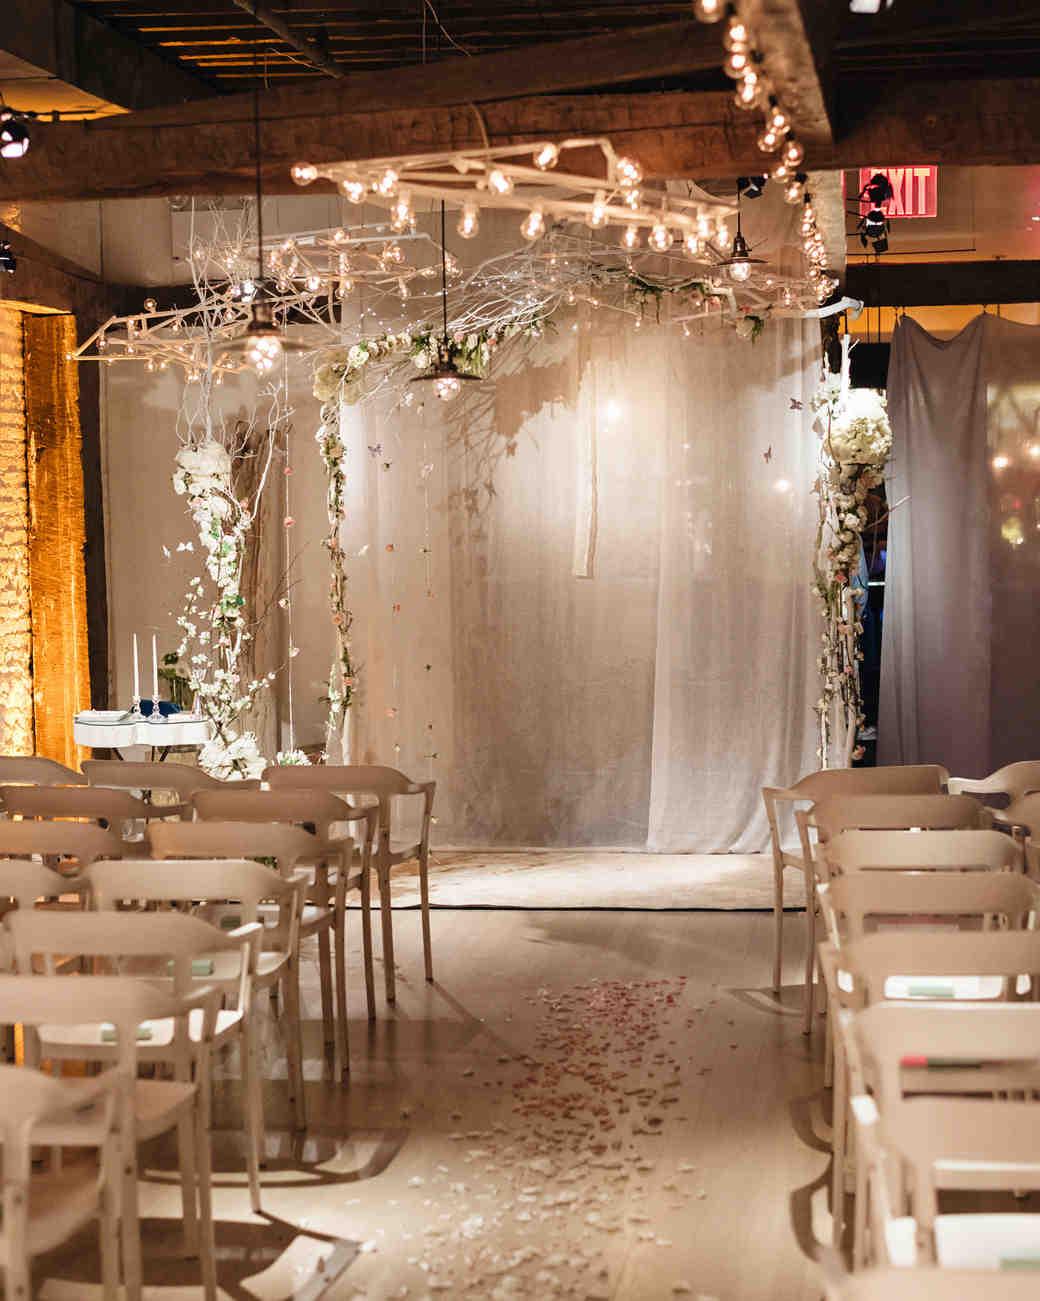 lori-jan-wedding-ceremony-01101-s112305-1215.jpg